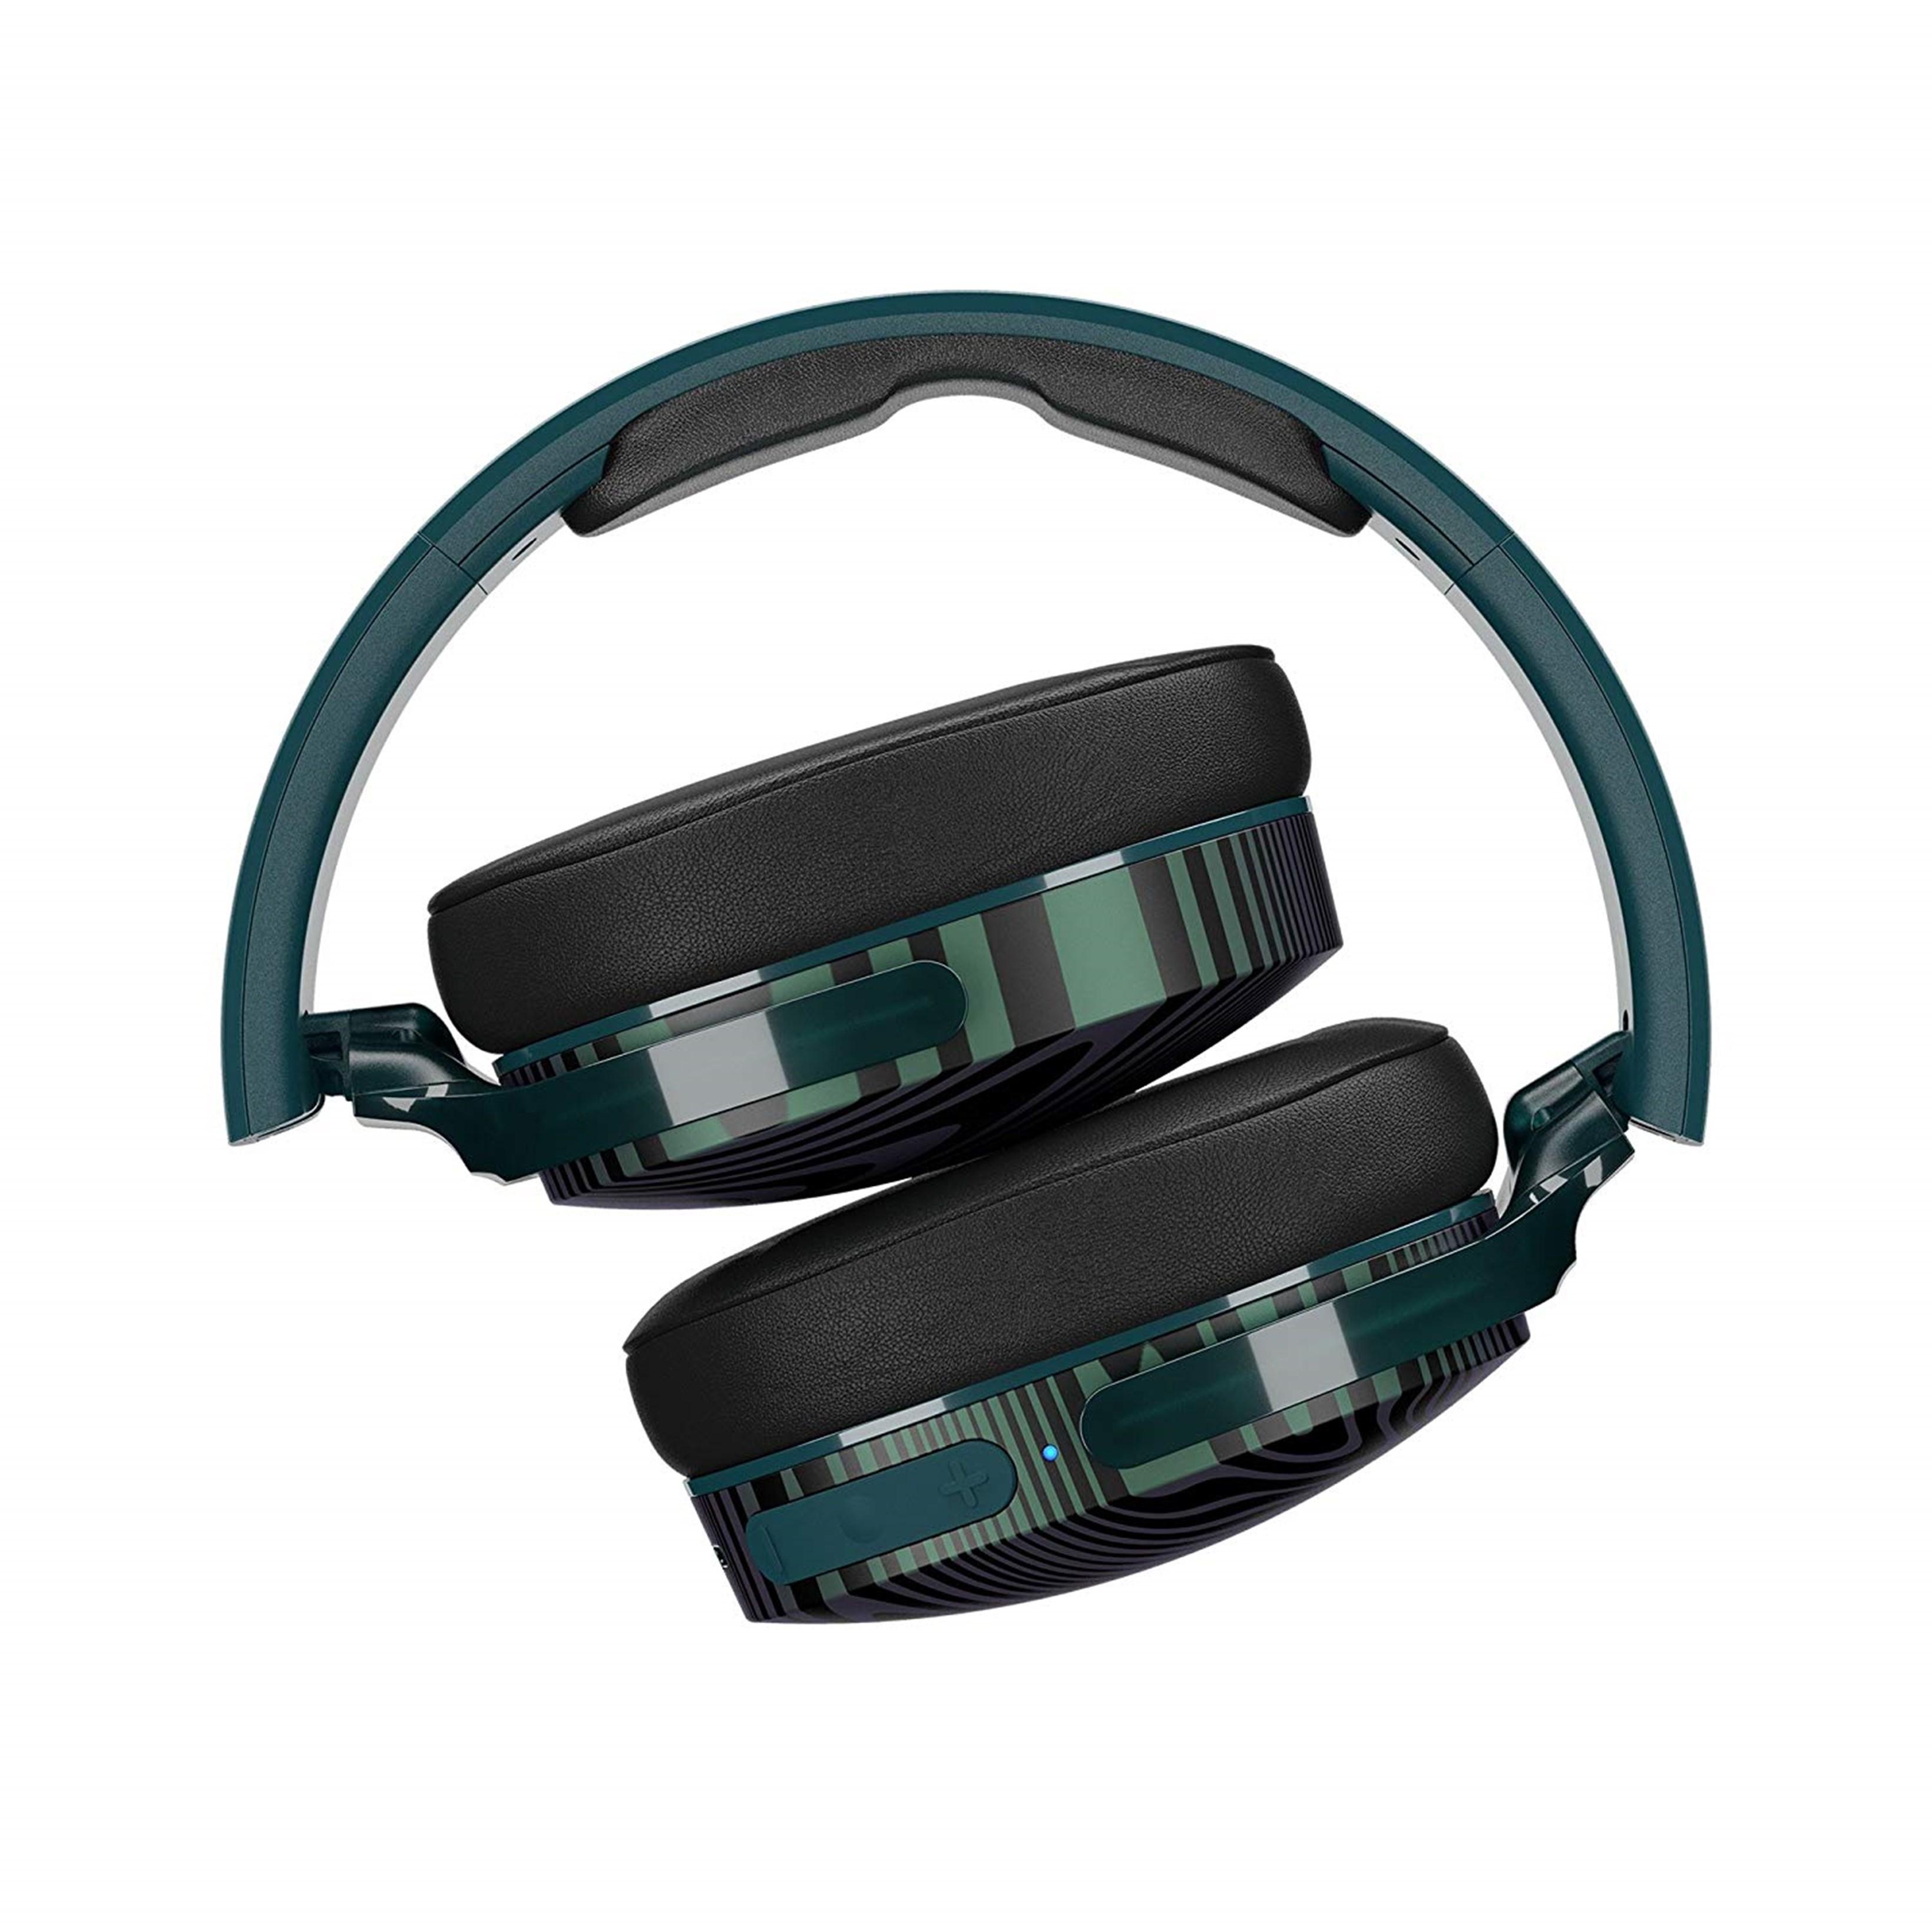 Skullcandy Hesh 3 Psycho Tropical Bluetooth Headphones - 3